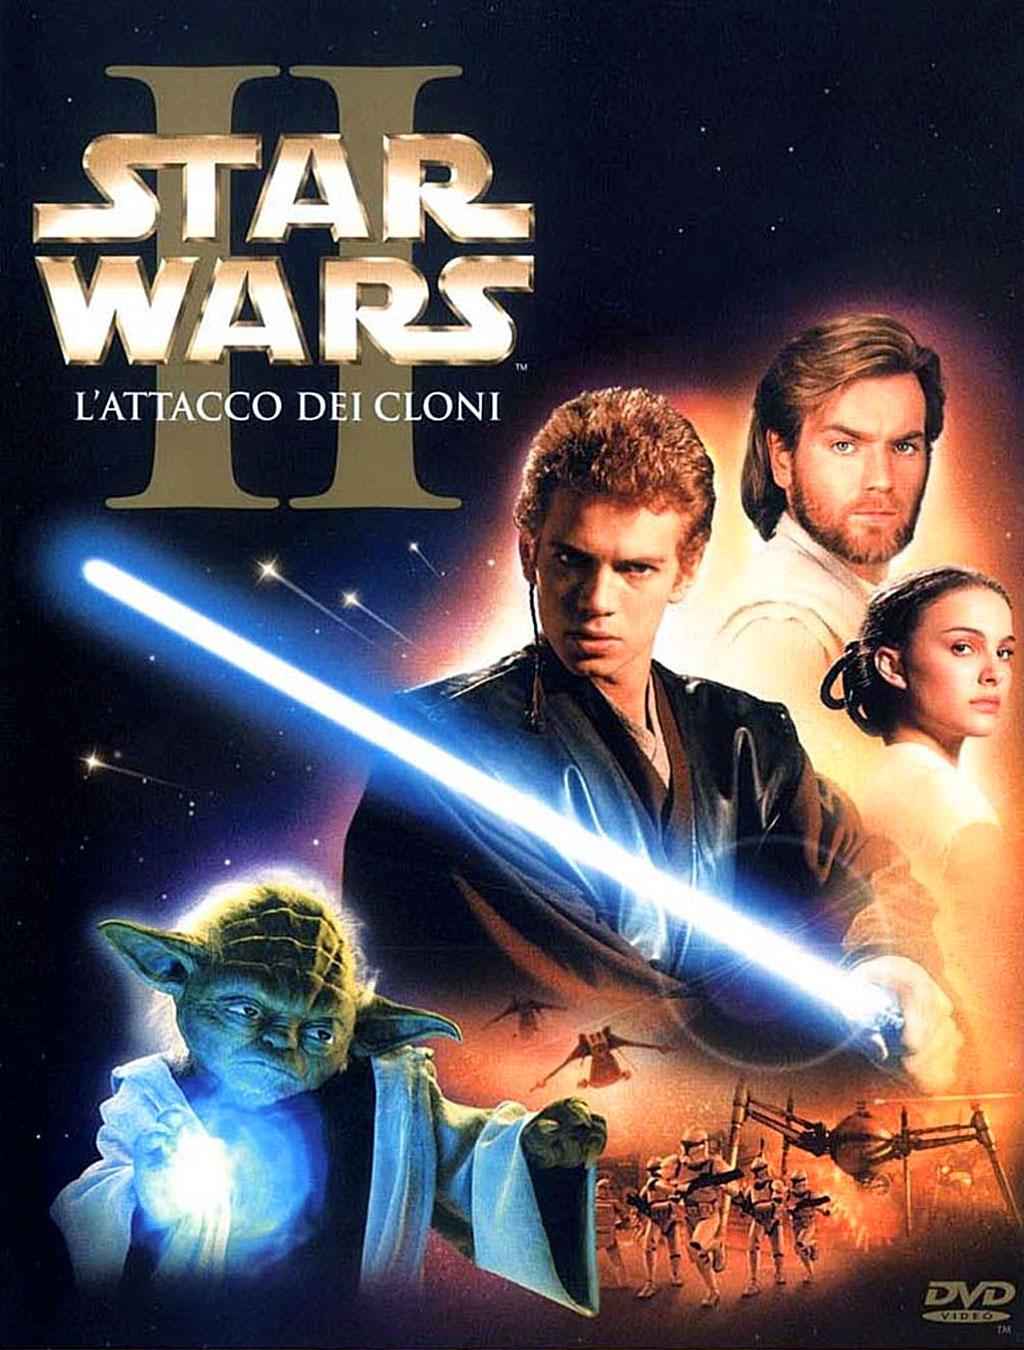 star wars - l'attacco dei cloni